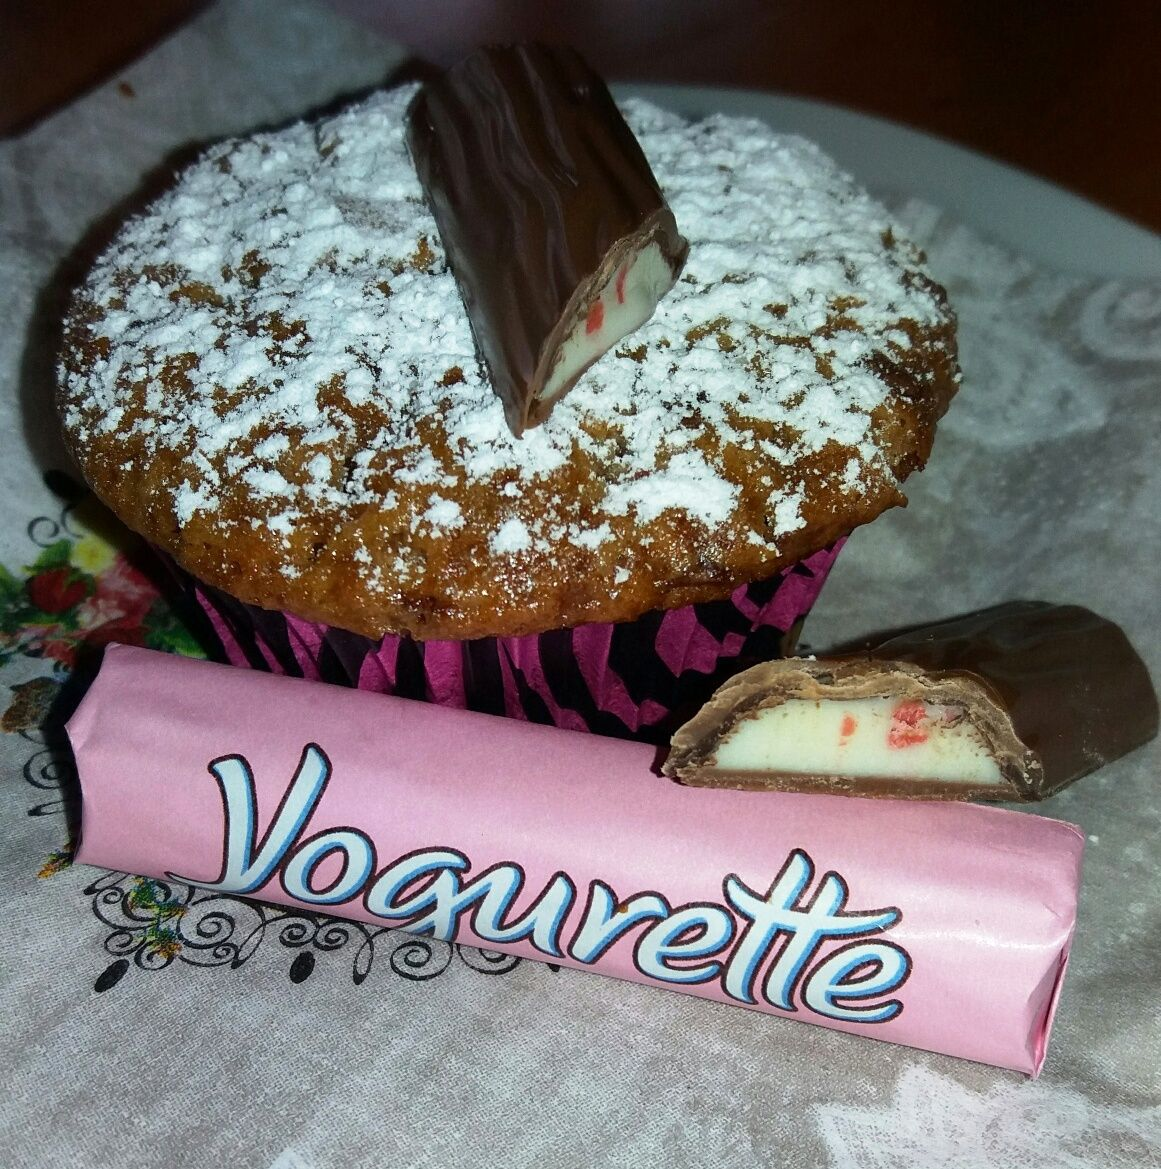 Yogurette Muffins In 2019 Wunderkessel Rezepte Muffins